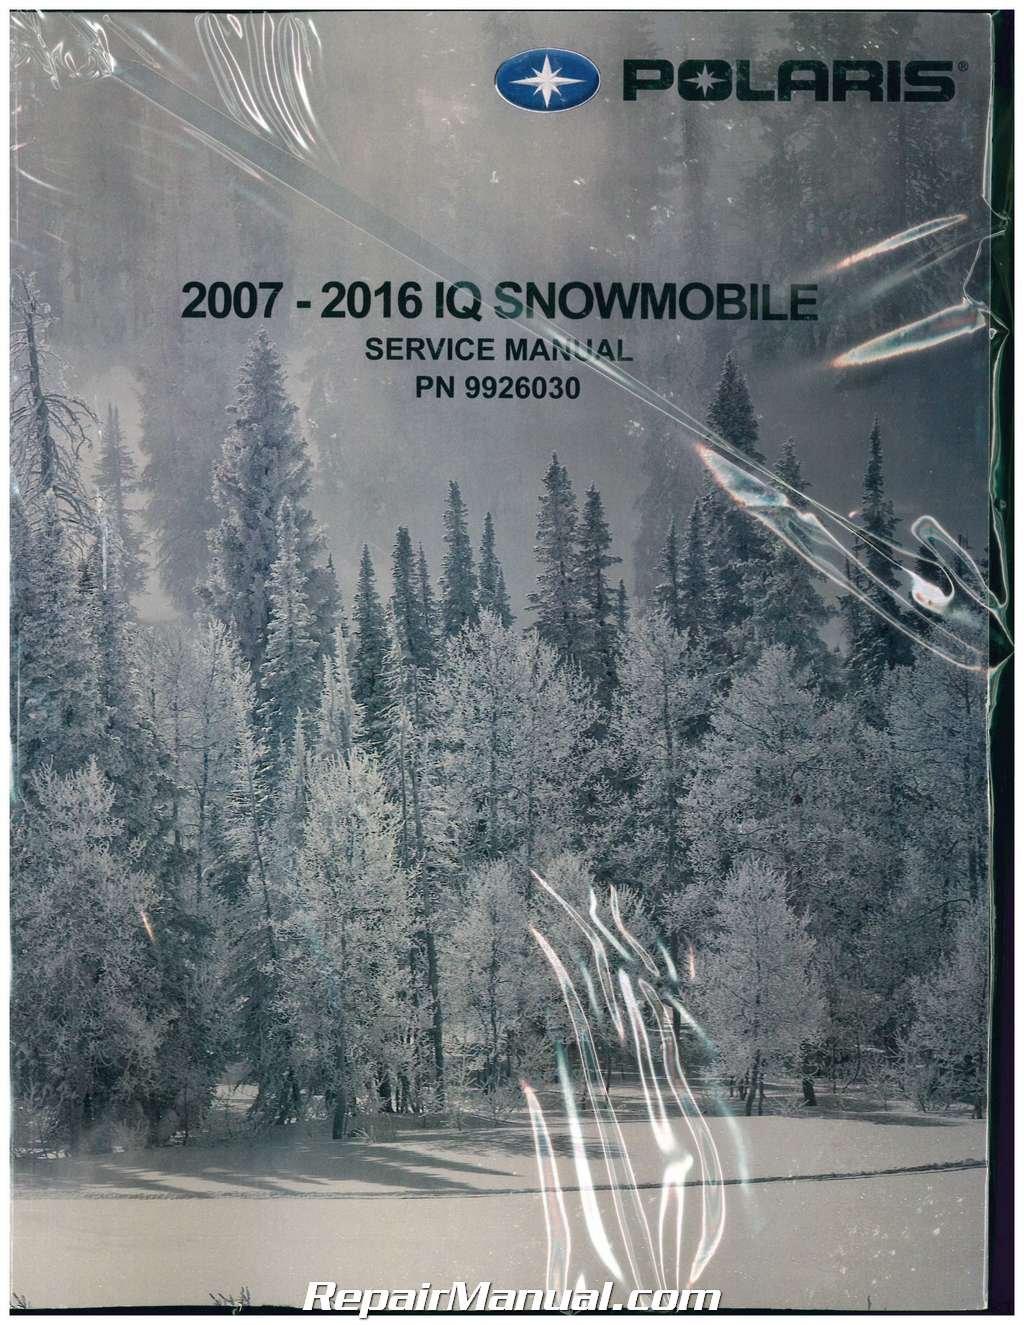 9926030 2007 2016 Polaris Iq Snowmobile Service Manual Manufacturer Wiring Diagram 2009 600 Shift Books